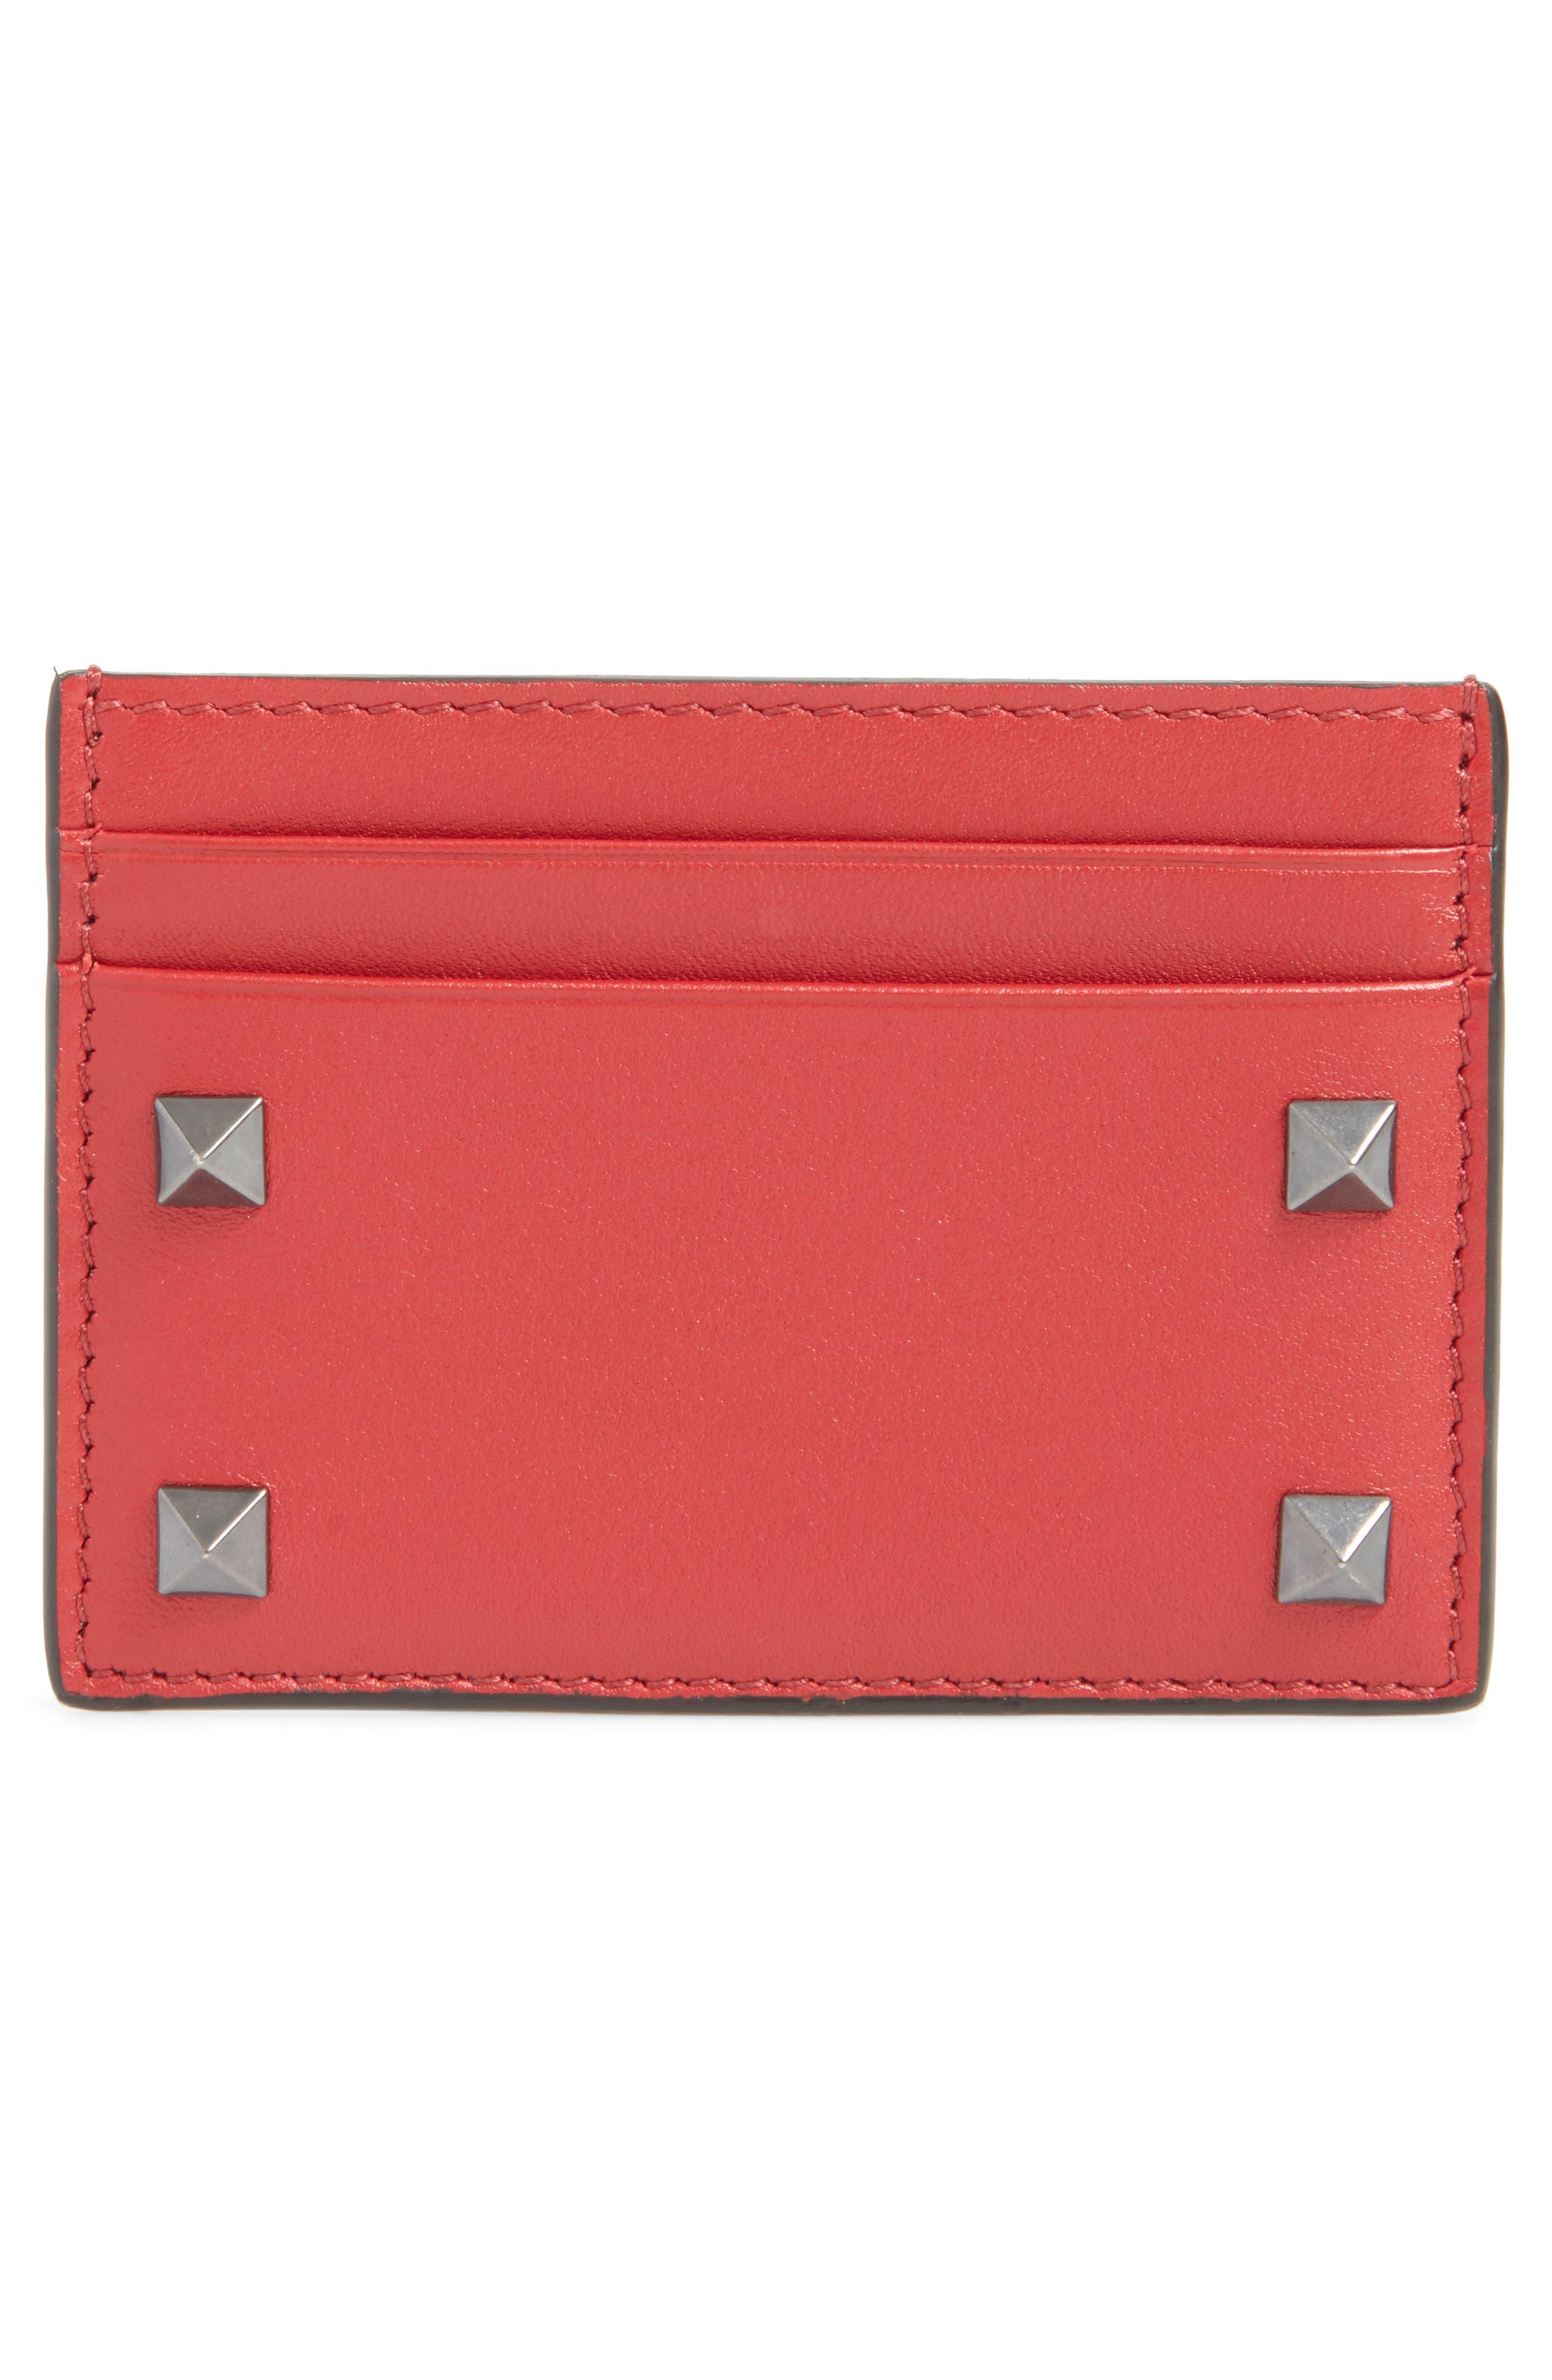 GARAVANI Stud Leather Card Case,                             Main thumbnail 1, color,                             Red